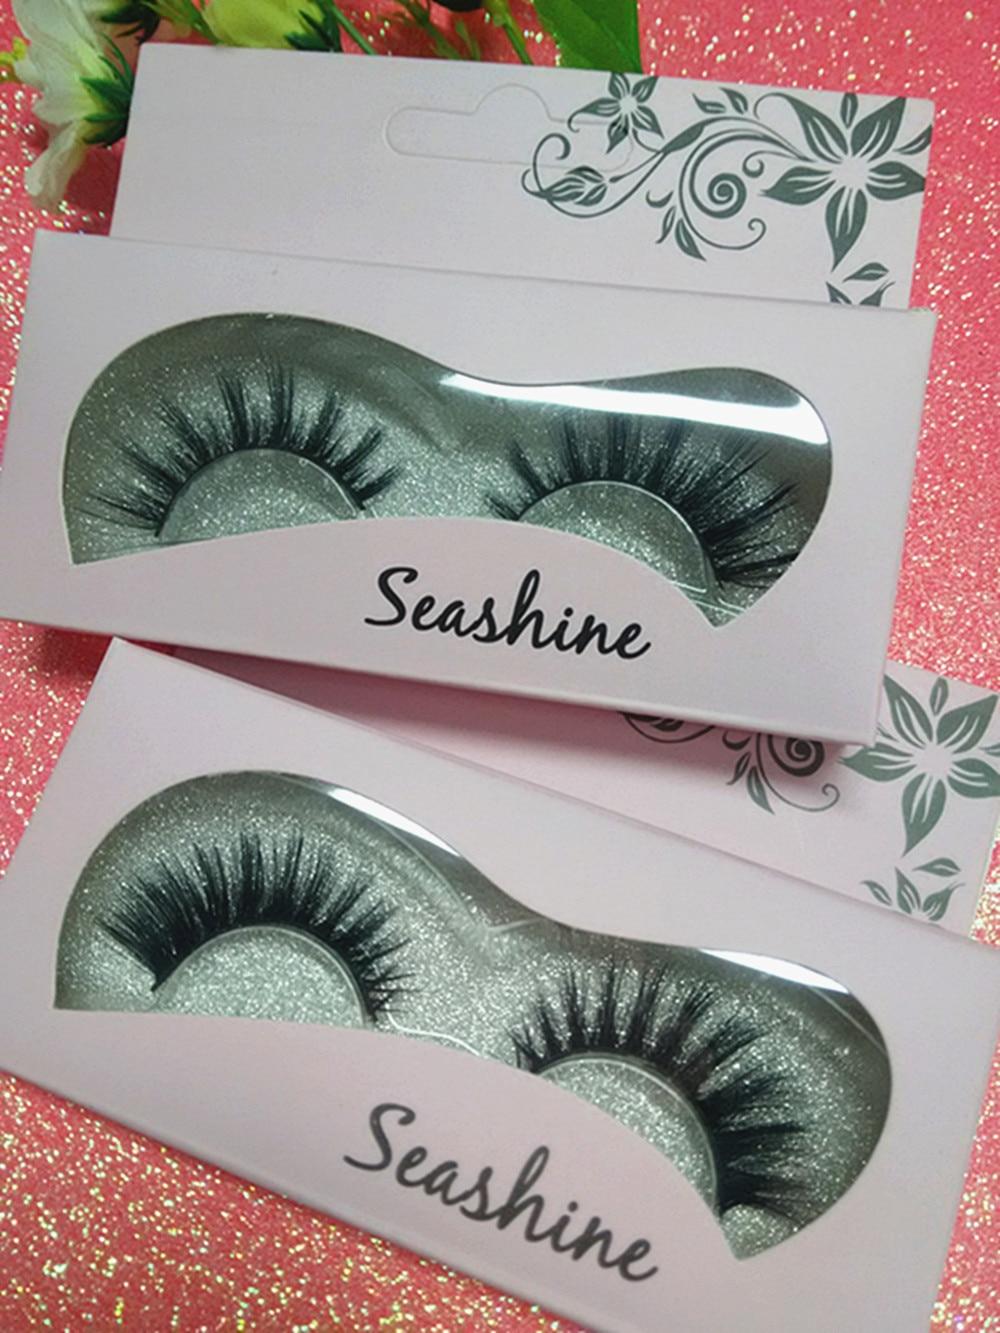 b781bf55aba Detail Feedback Questions about Seashine 10 Pairs 3D Silk Strip Lashes 100%  Handmade False Mink Eyelash South Korea Custom Packaging With Logo Free  Shipping ...